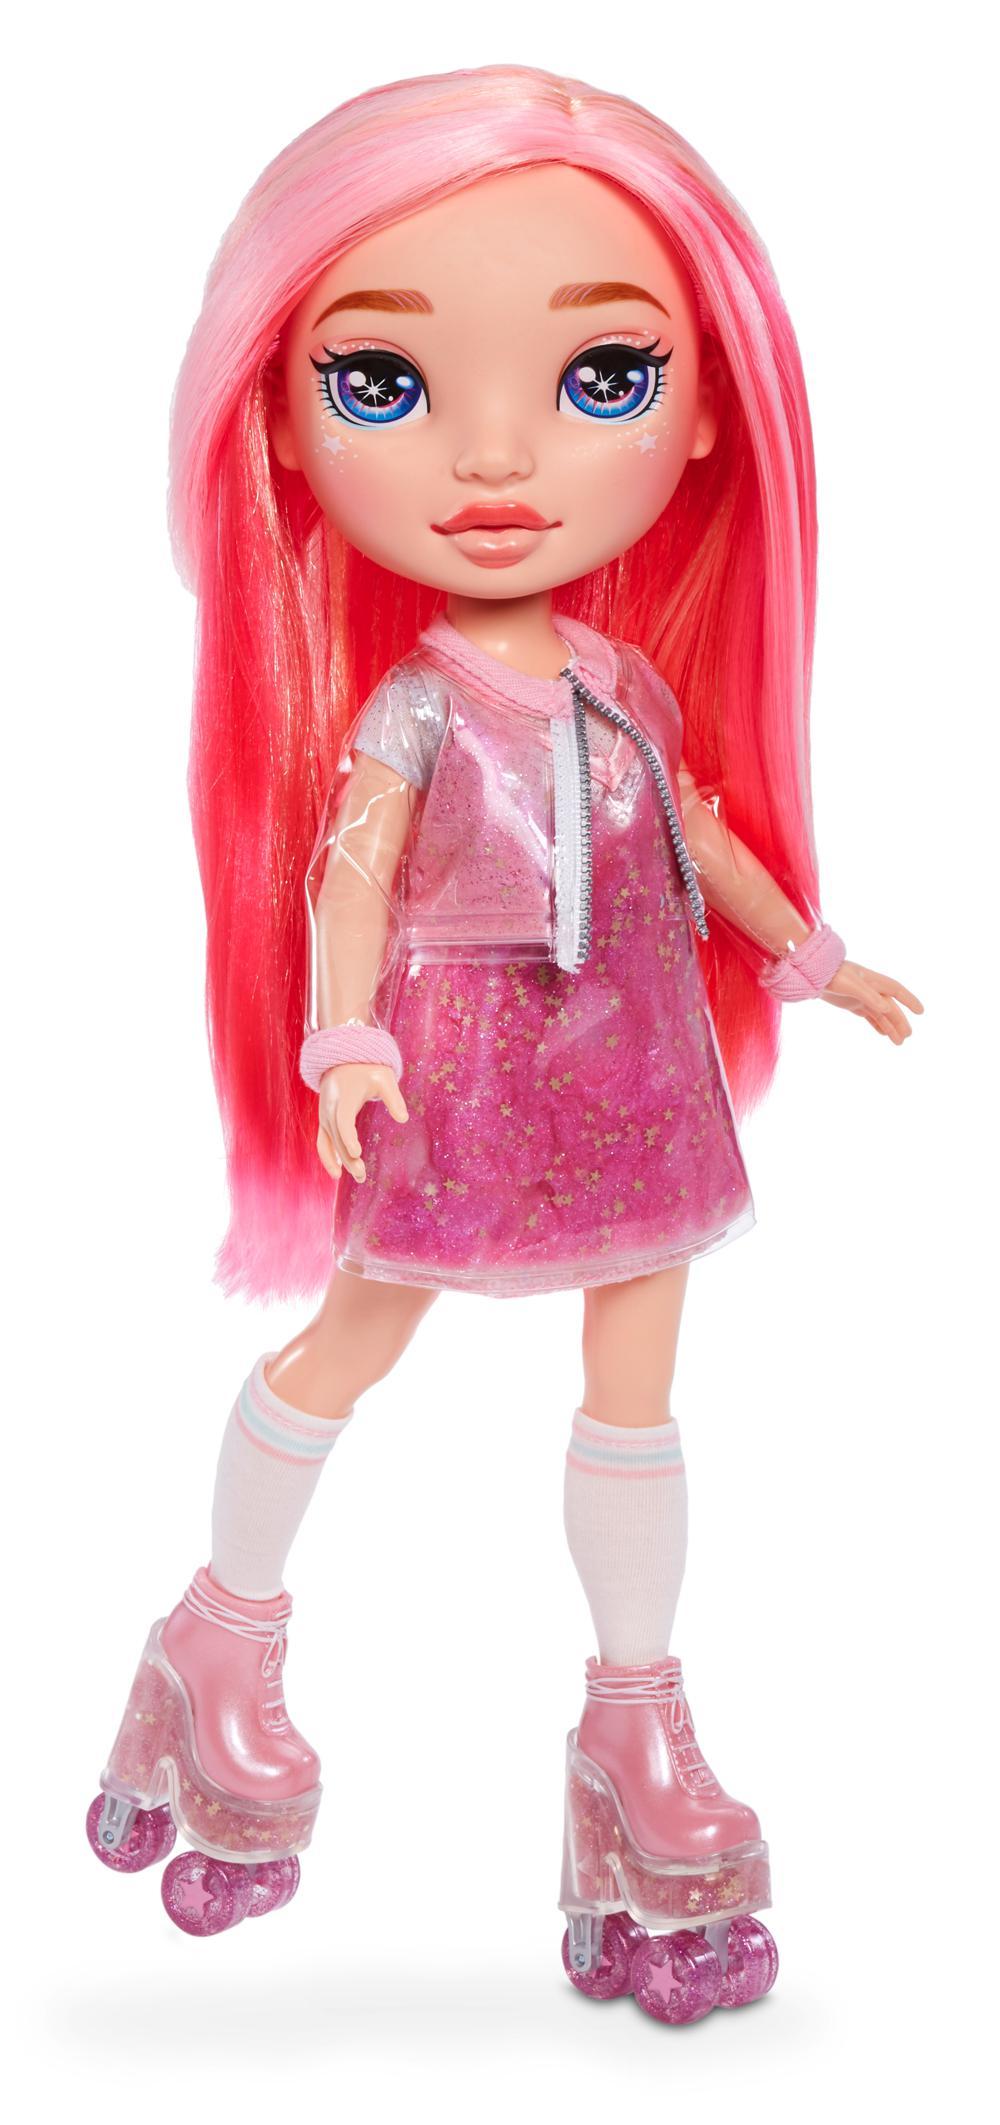 Rainbow Surprise - Surprise Doll assortie